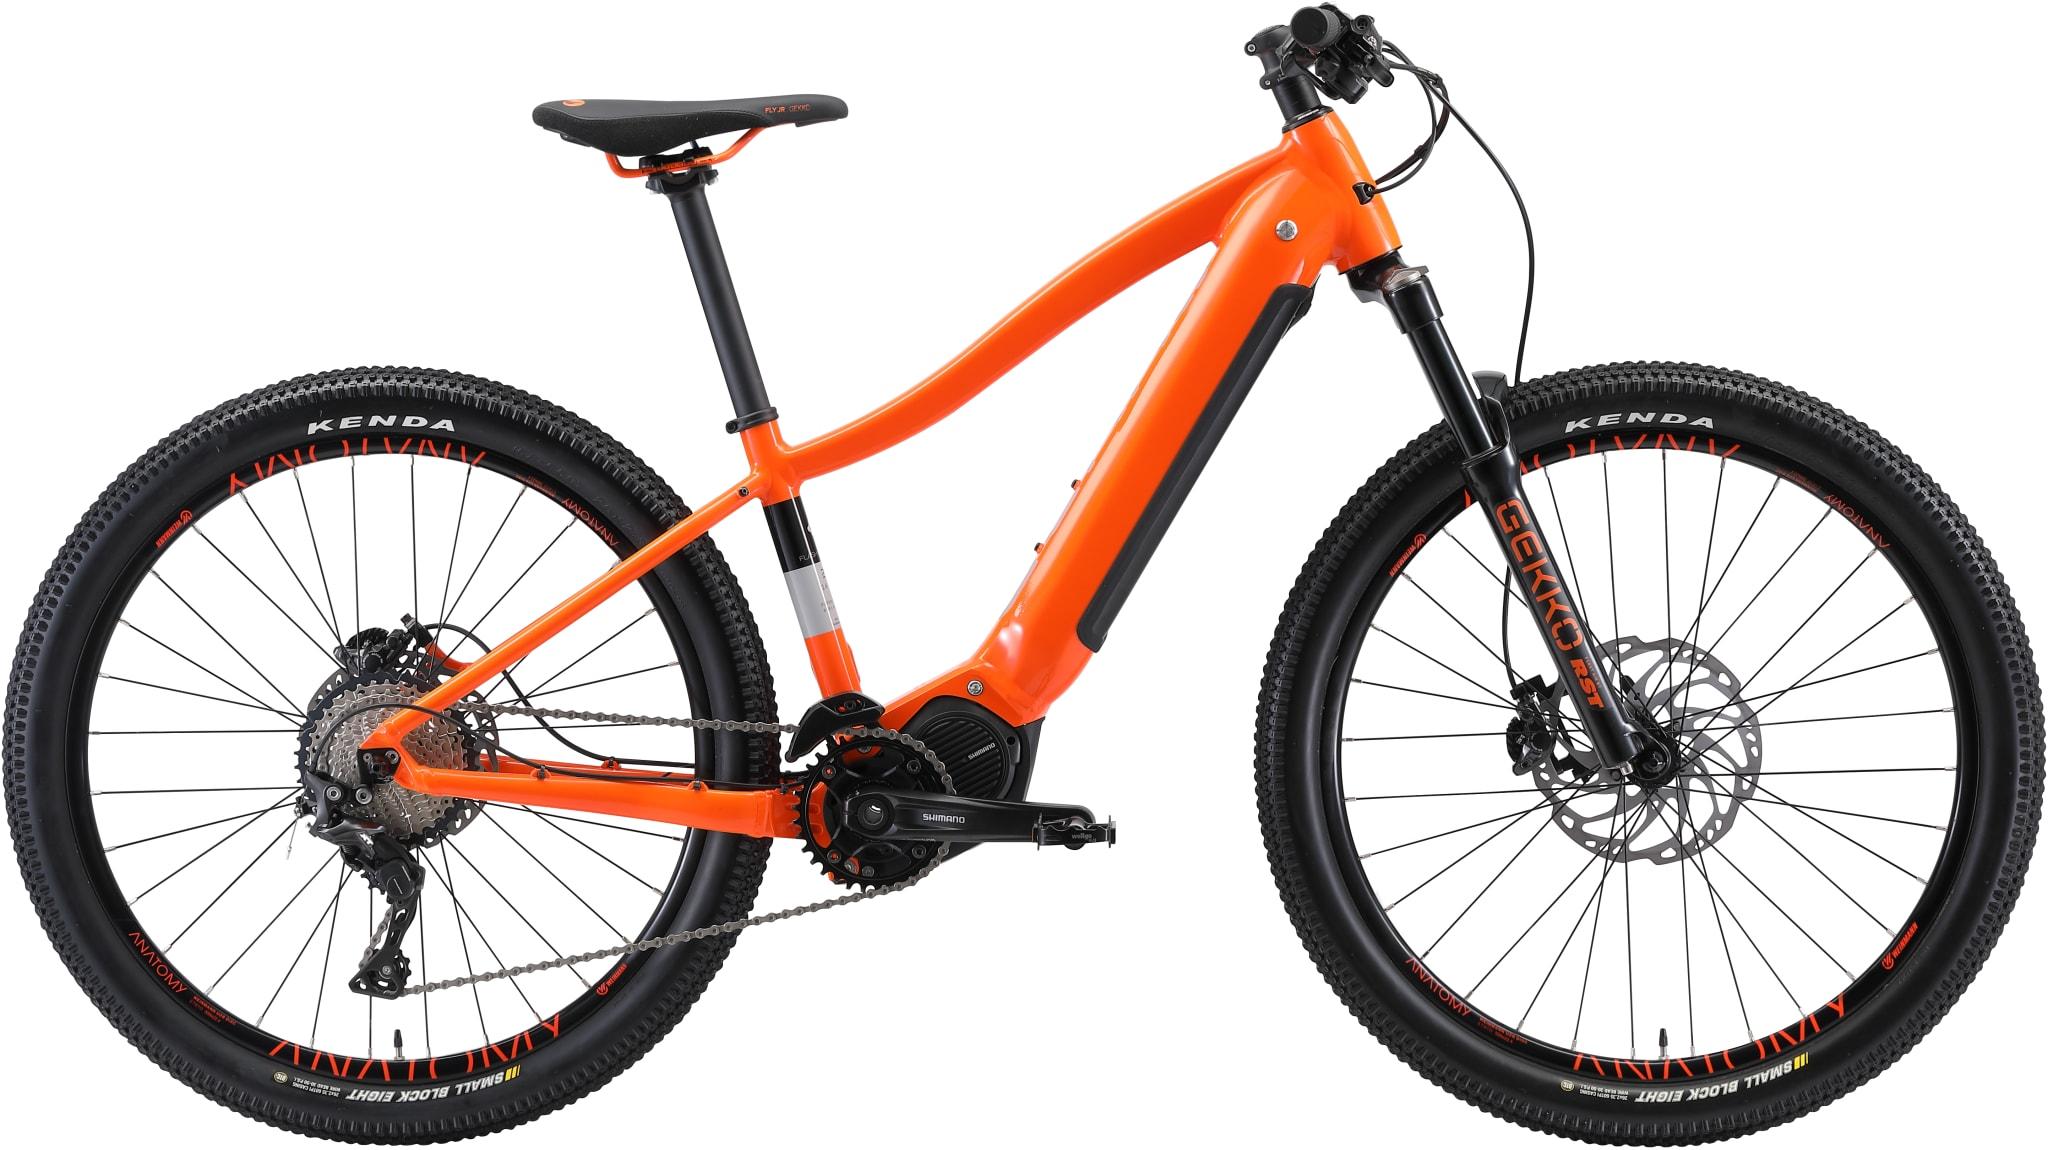 Fullblods El sykkel til barn/ungdom